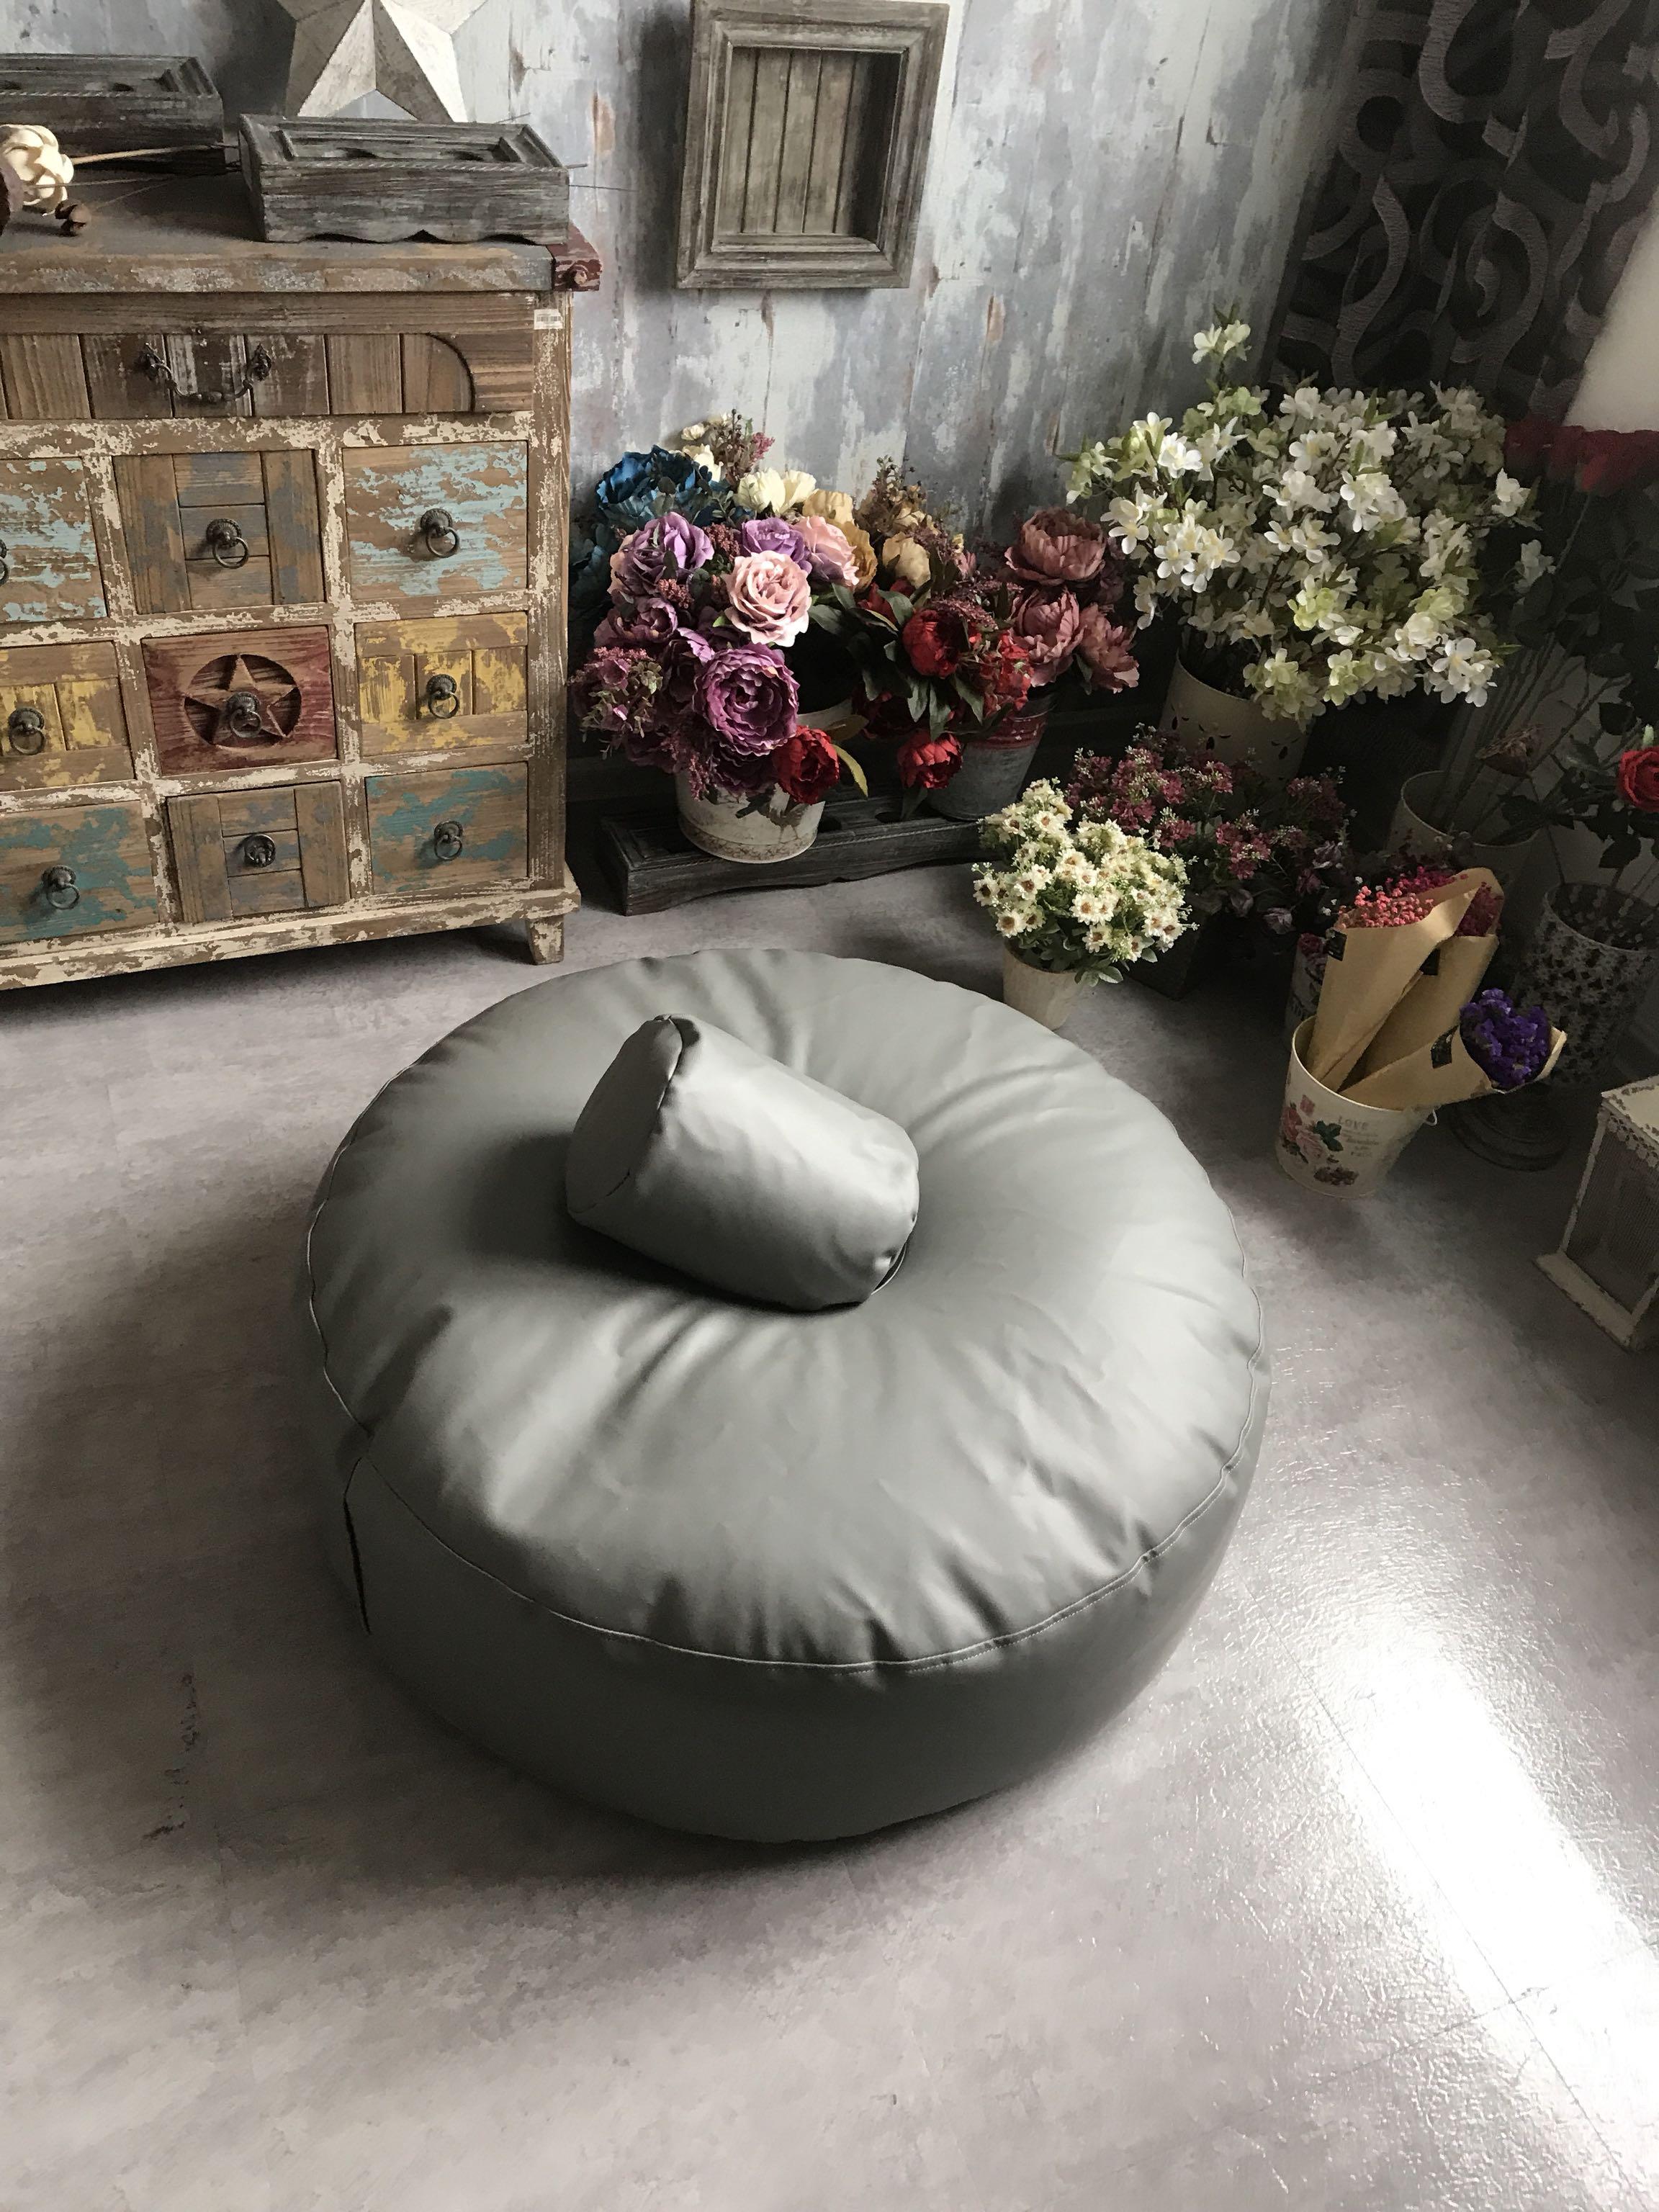 2018 Newborn Photography Studio POSING PILLOW Newborn Poser Ottoman Beanbag Photo Prop Infant Poser 85CM Big Size Rack Bean Bag